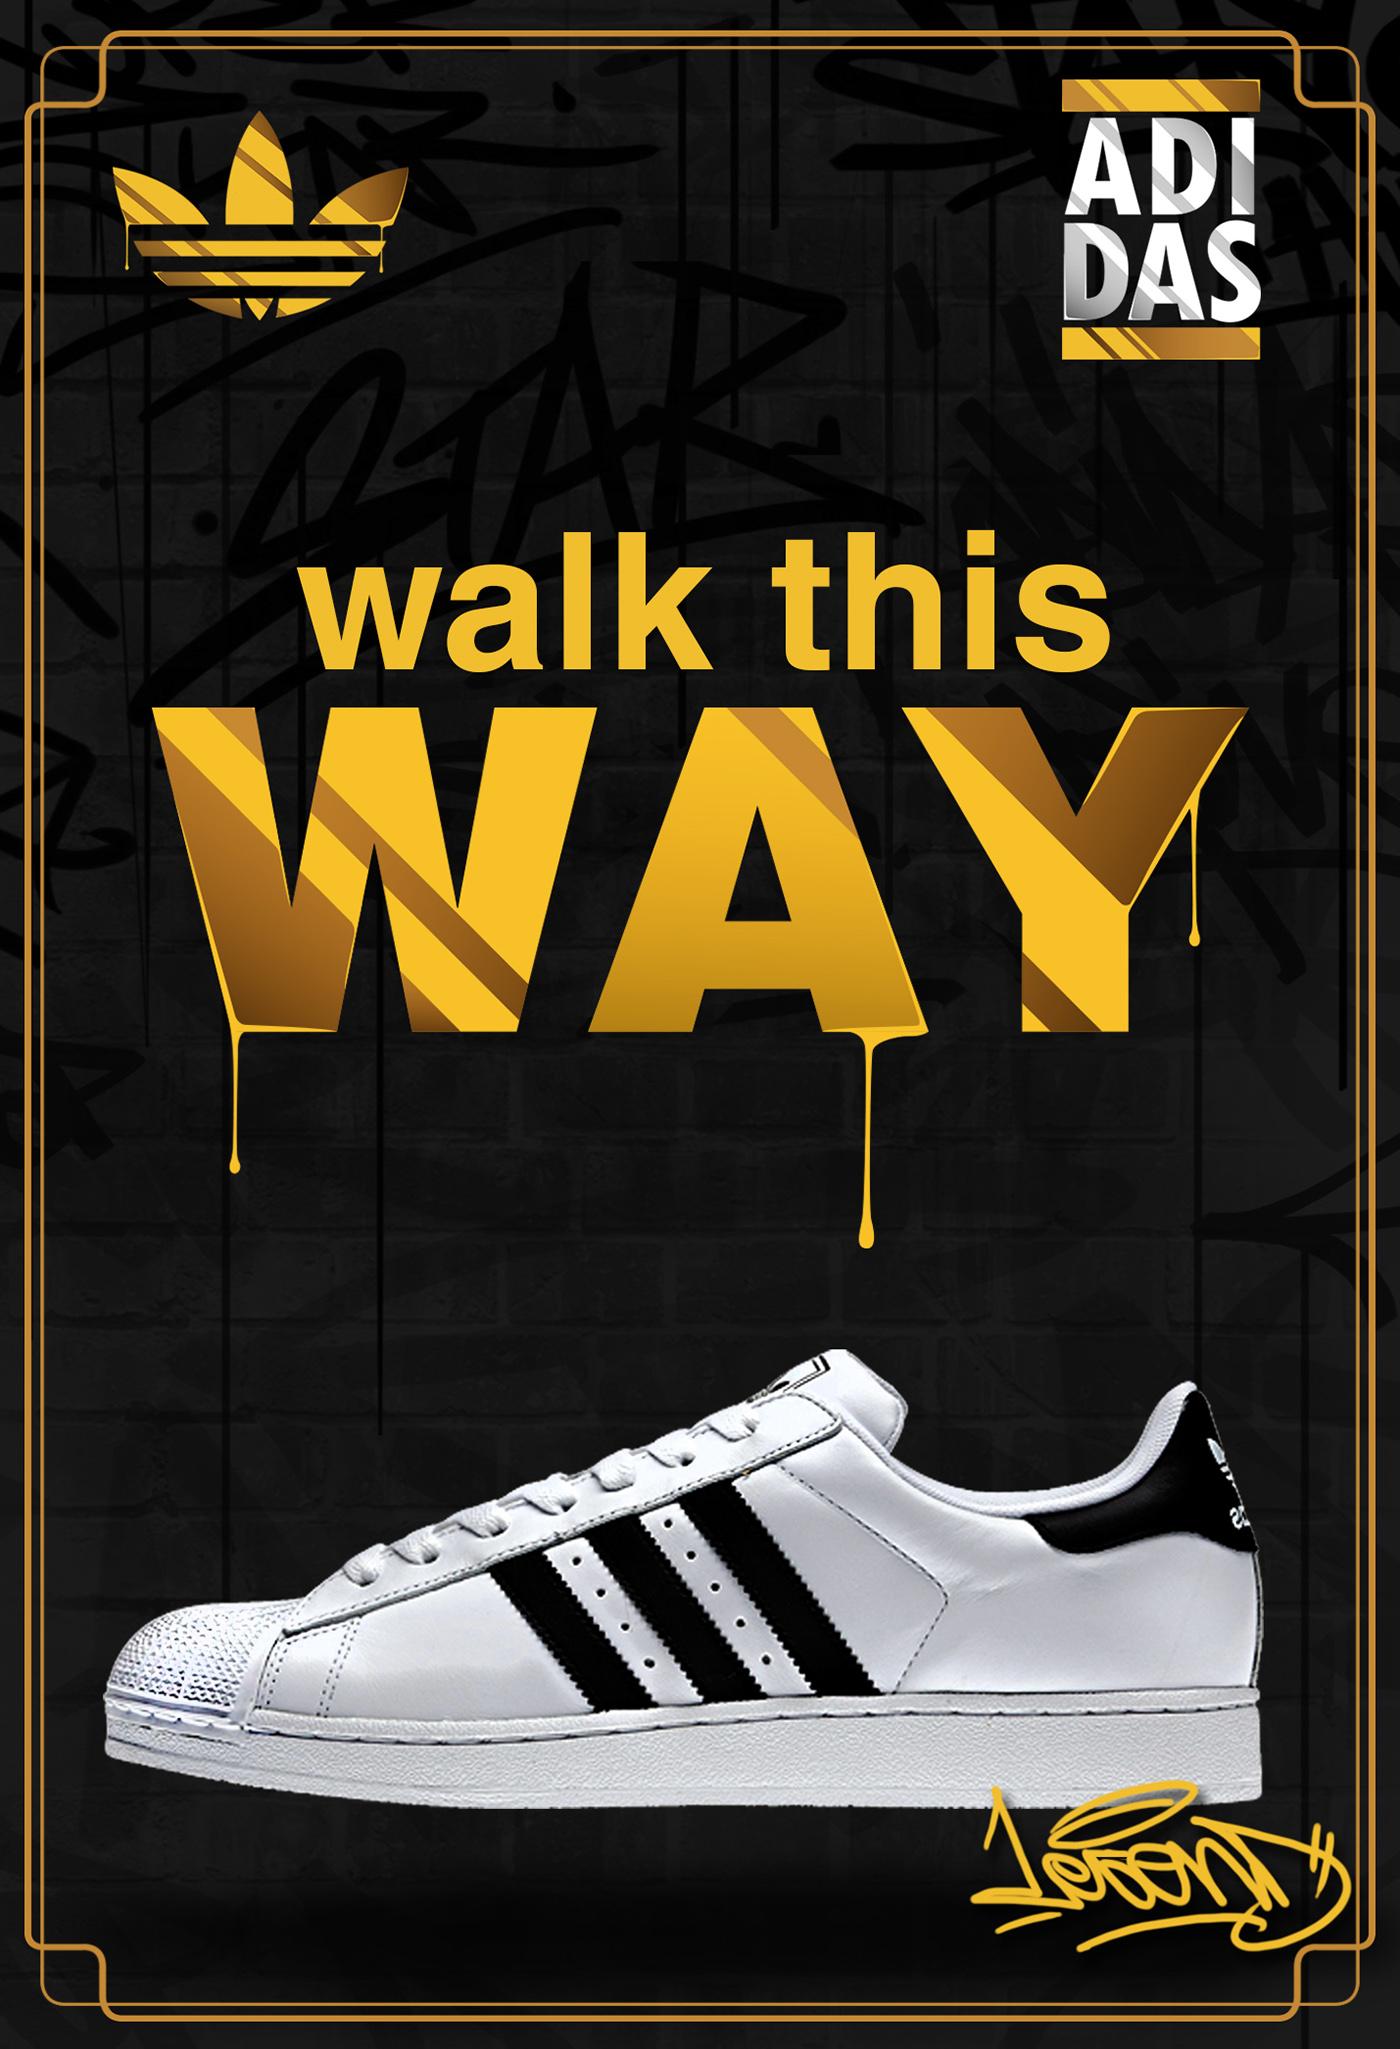 adidas original advert poster - photo #2